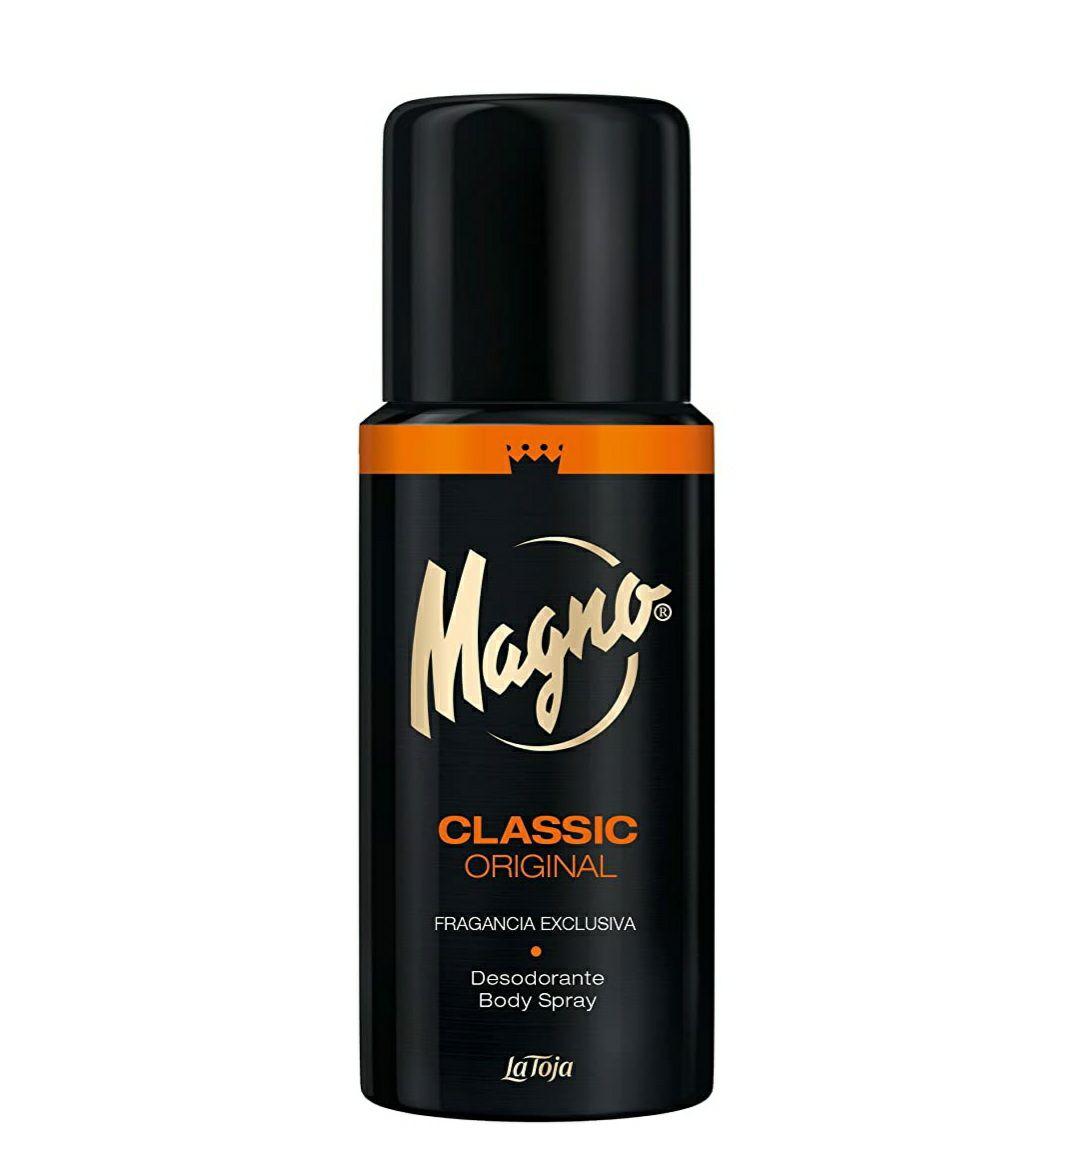 Desodorante Magno Spray Classic